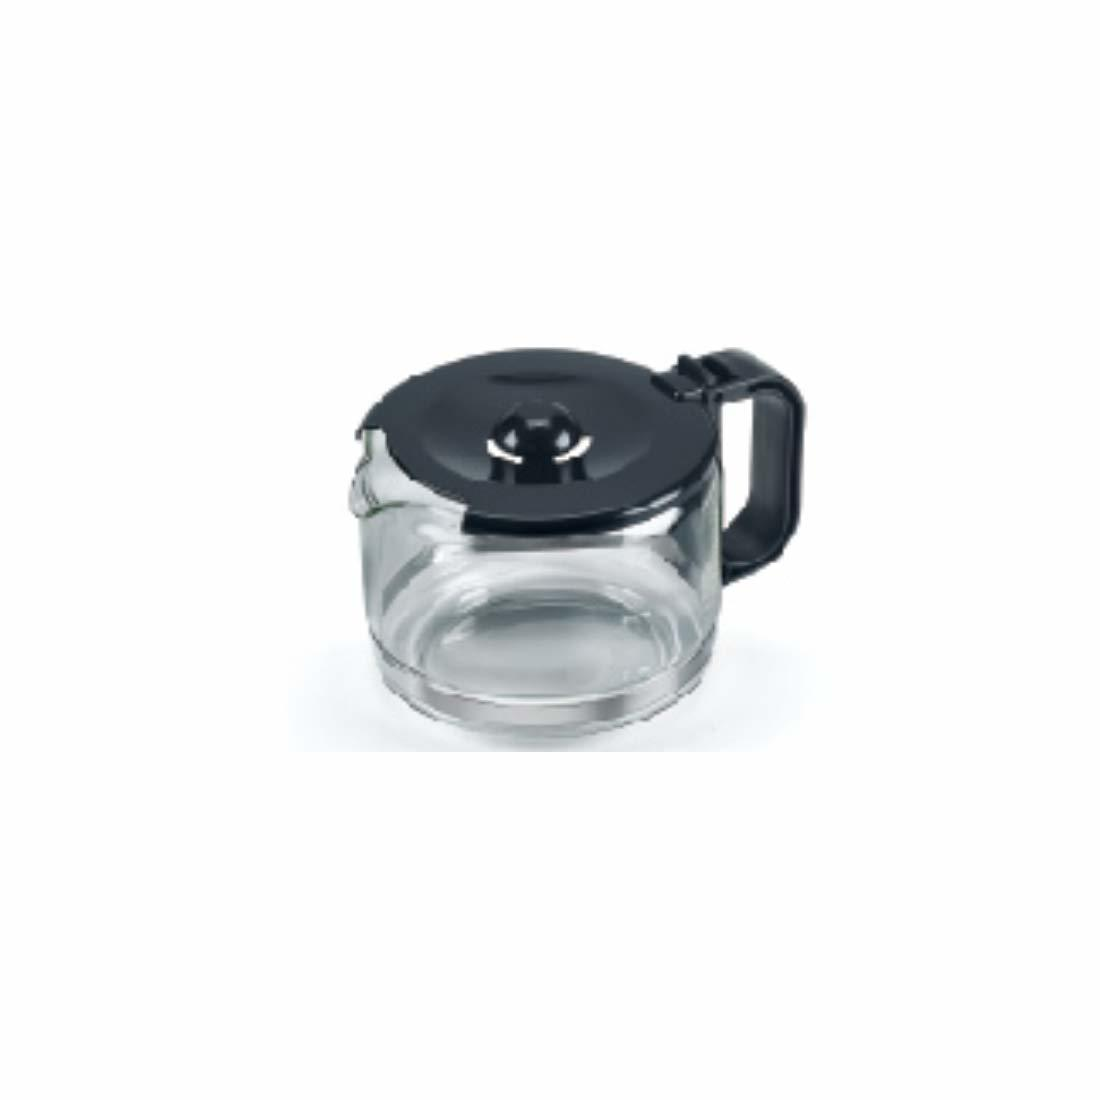 Prestige PCMD 1.0 650-Watt Drip Coffee Maker, Multi Color